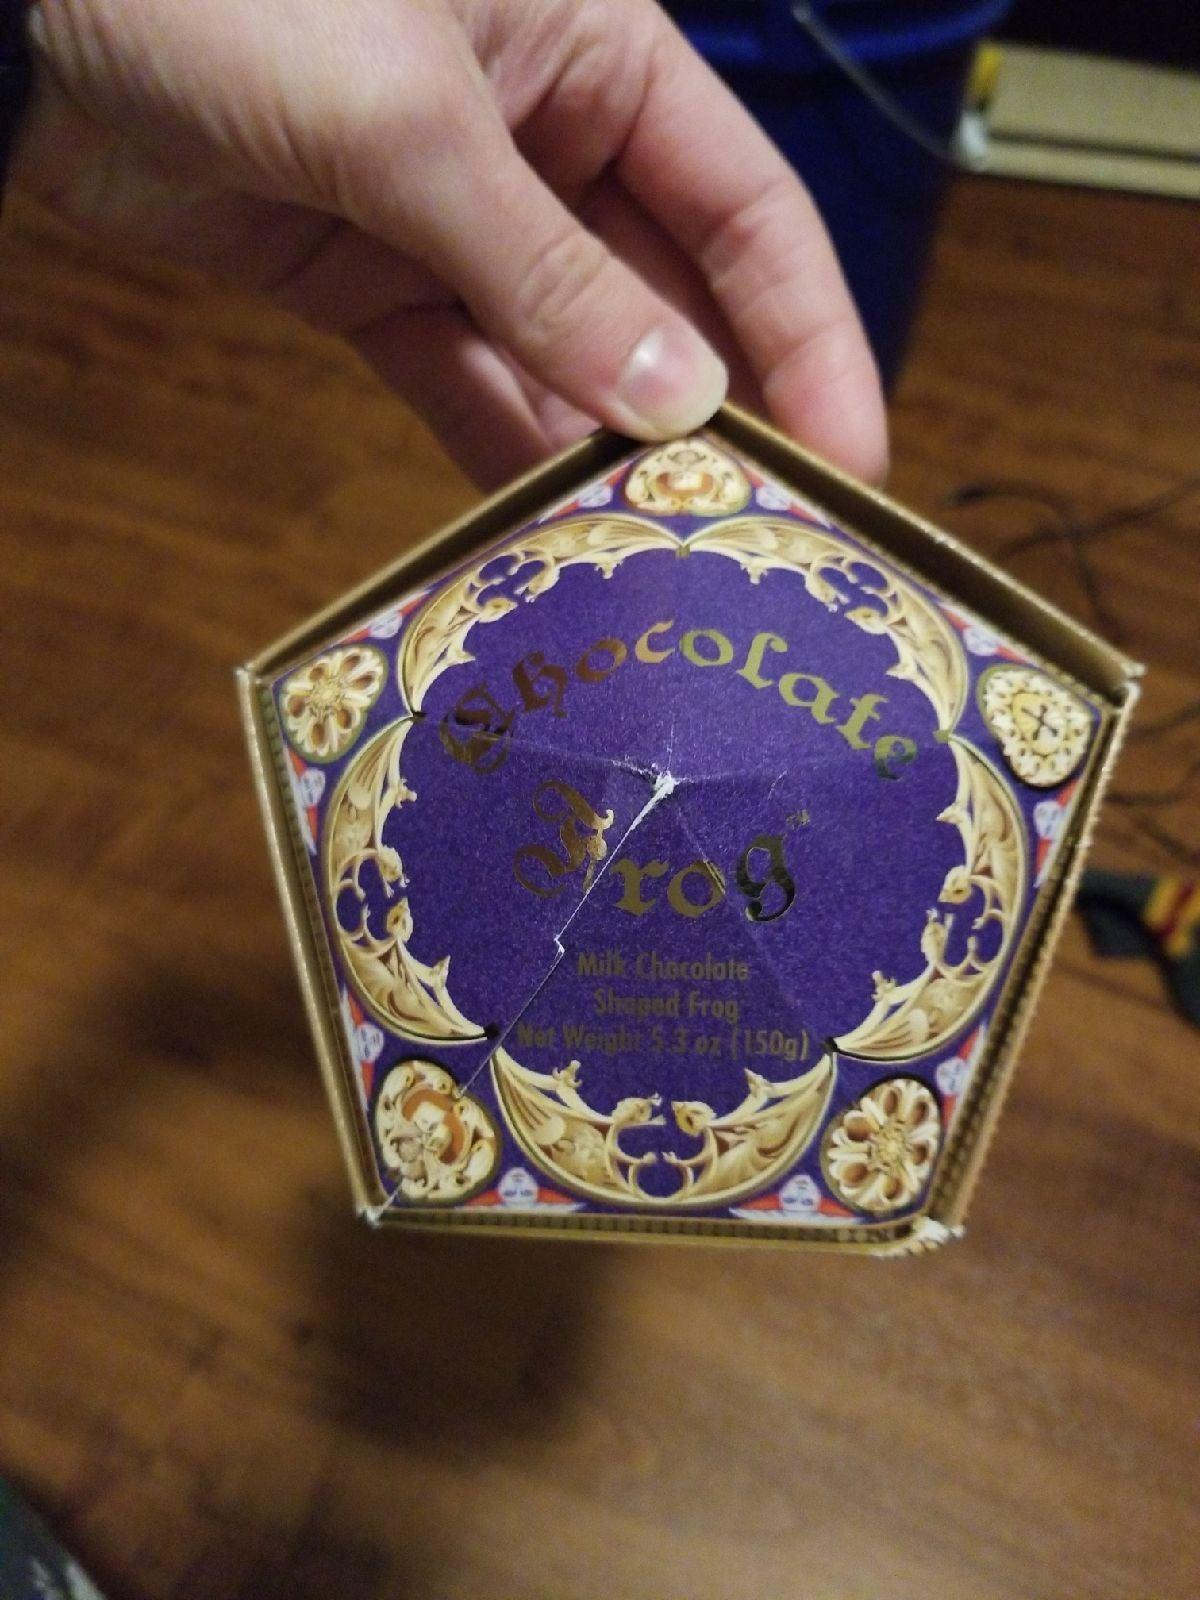 Harry Potter Chocolate Frog Godric Gryff